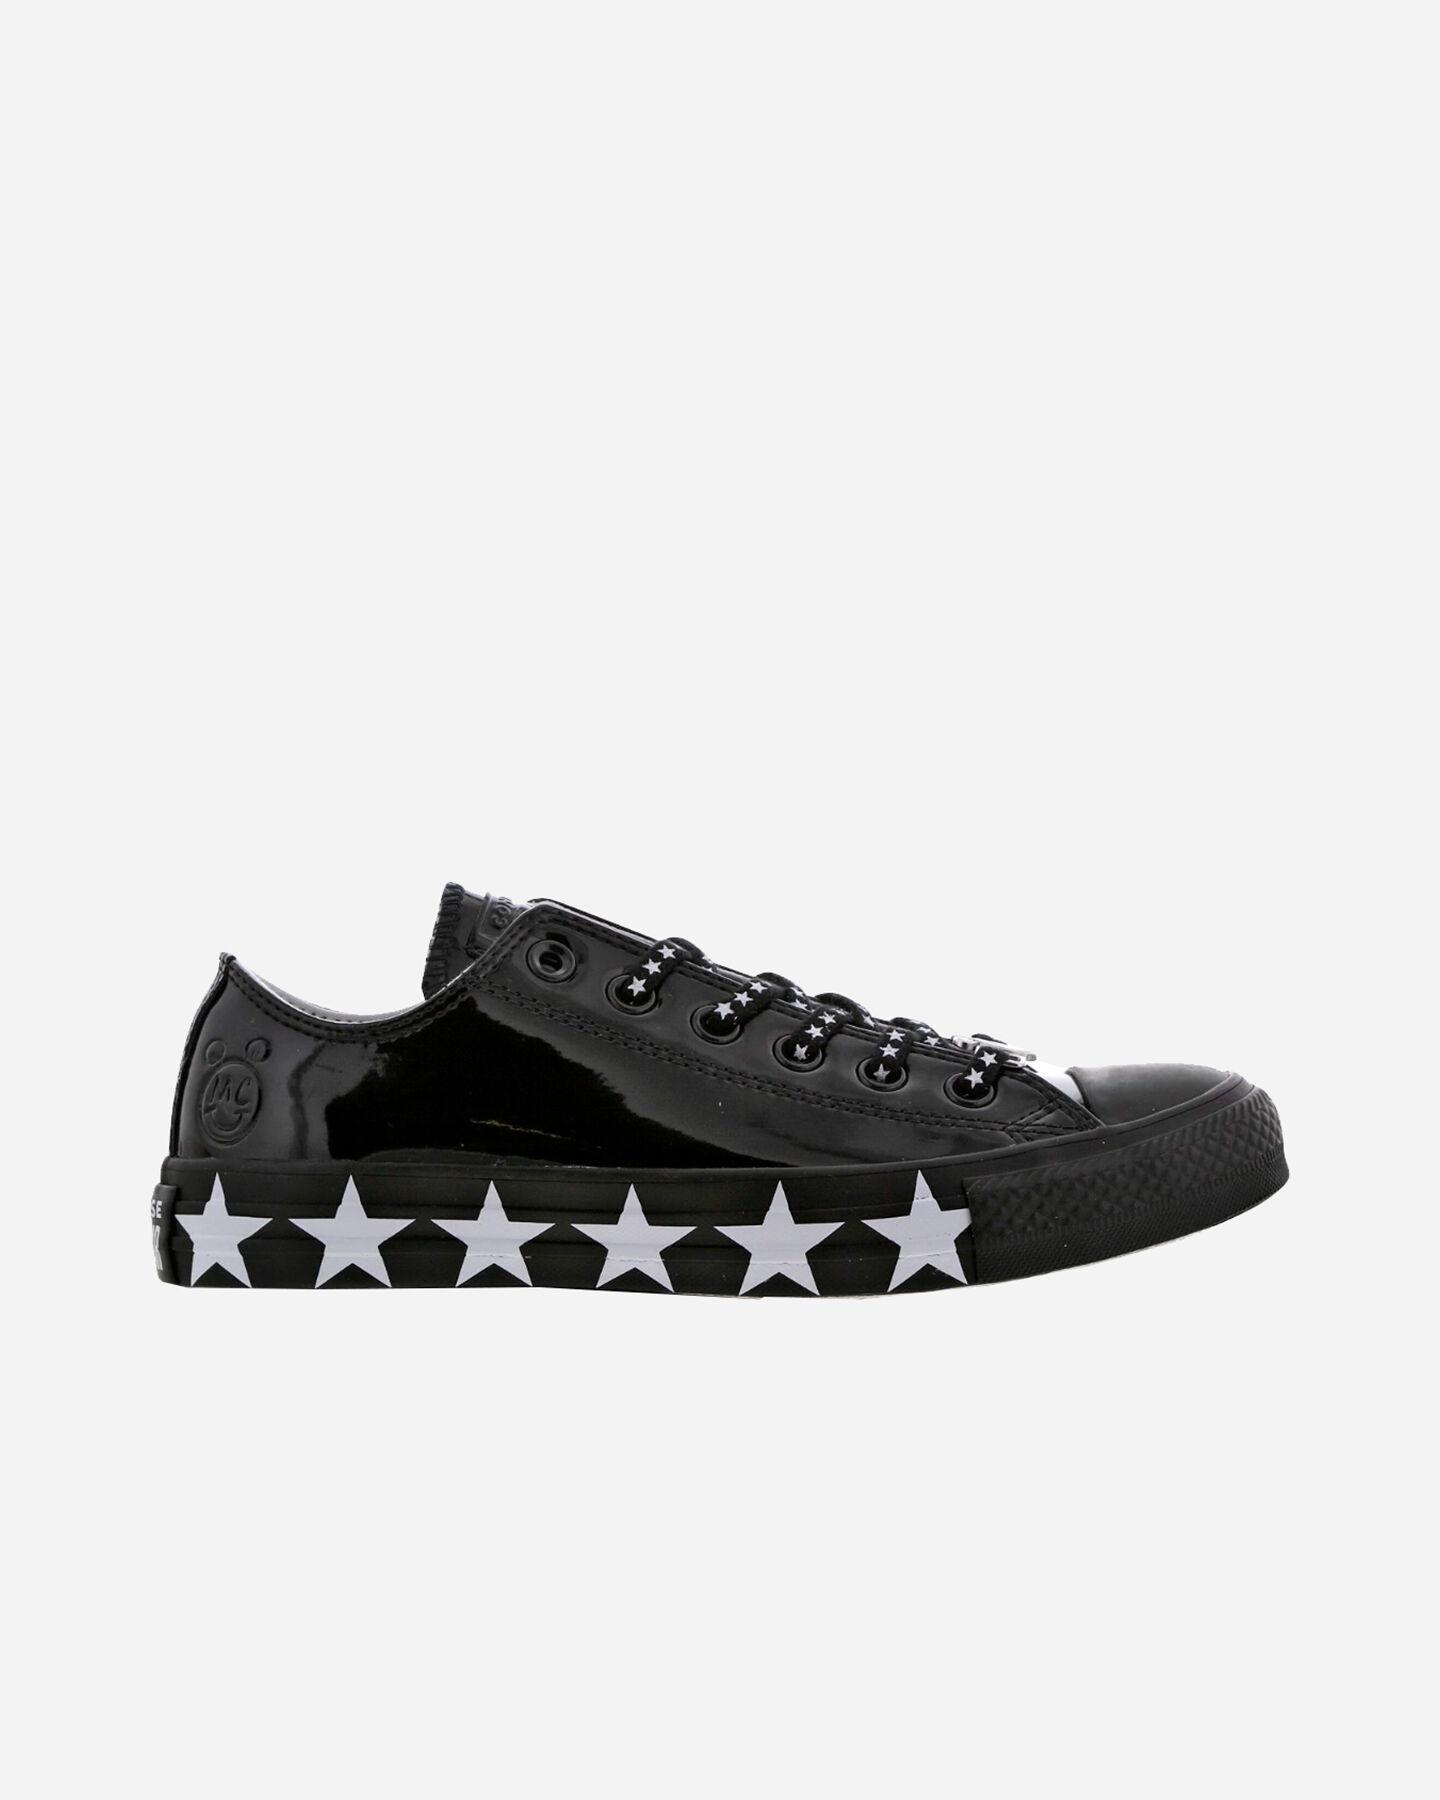 Sneakers Wzwoifqnp Scarpe Converse Stars Cisalfa E All 0onkpwx8 Sport kXZuwTlPiO